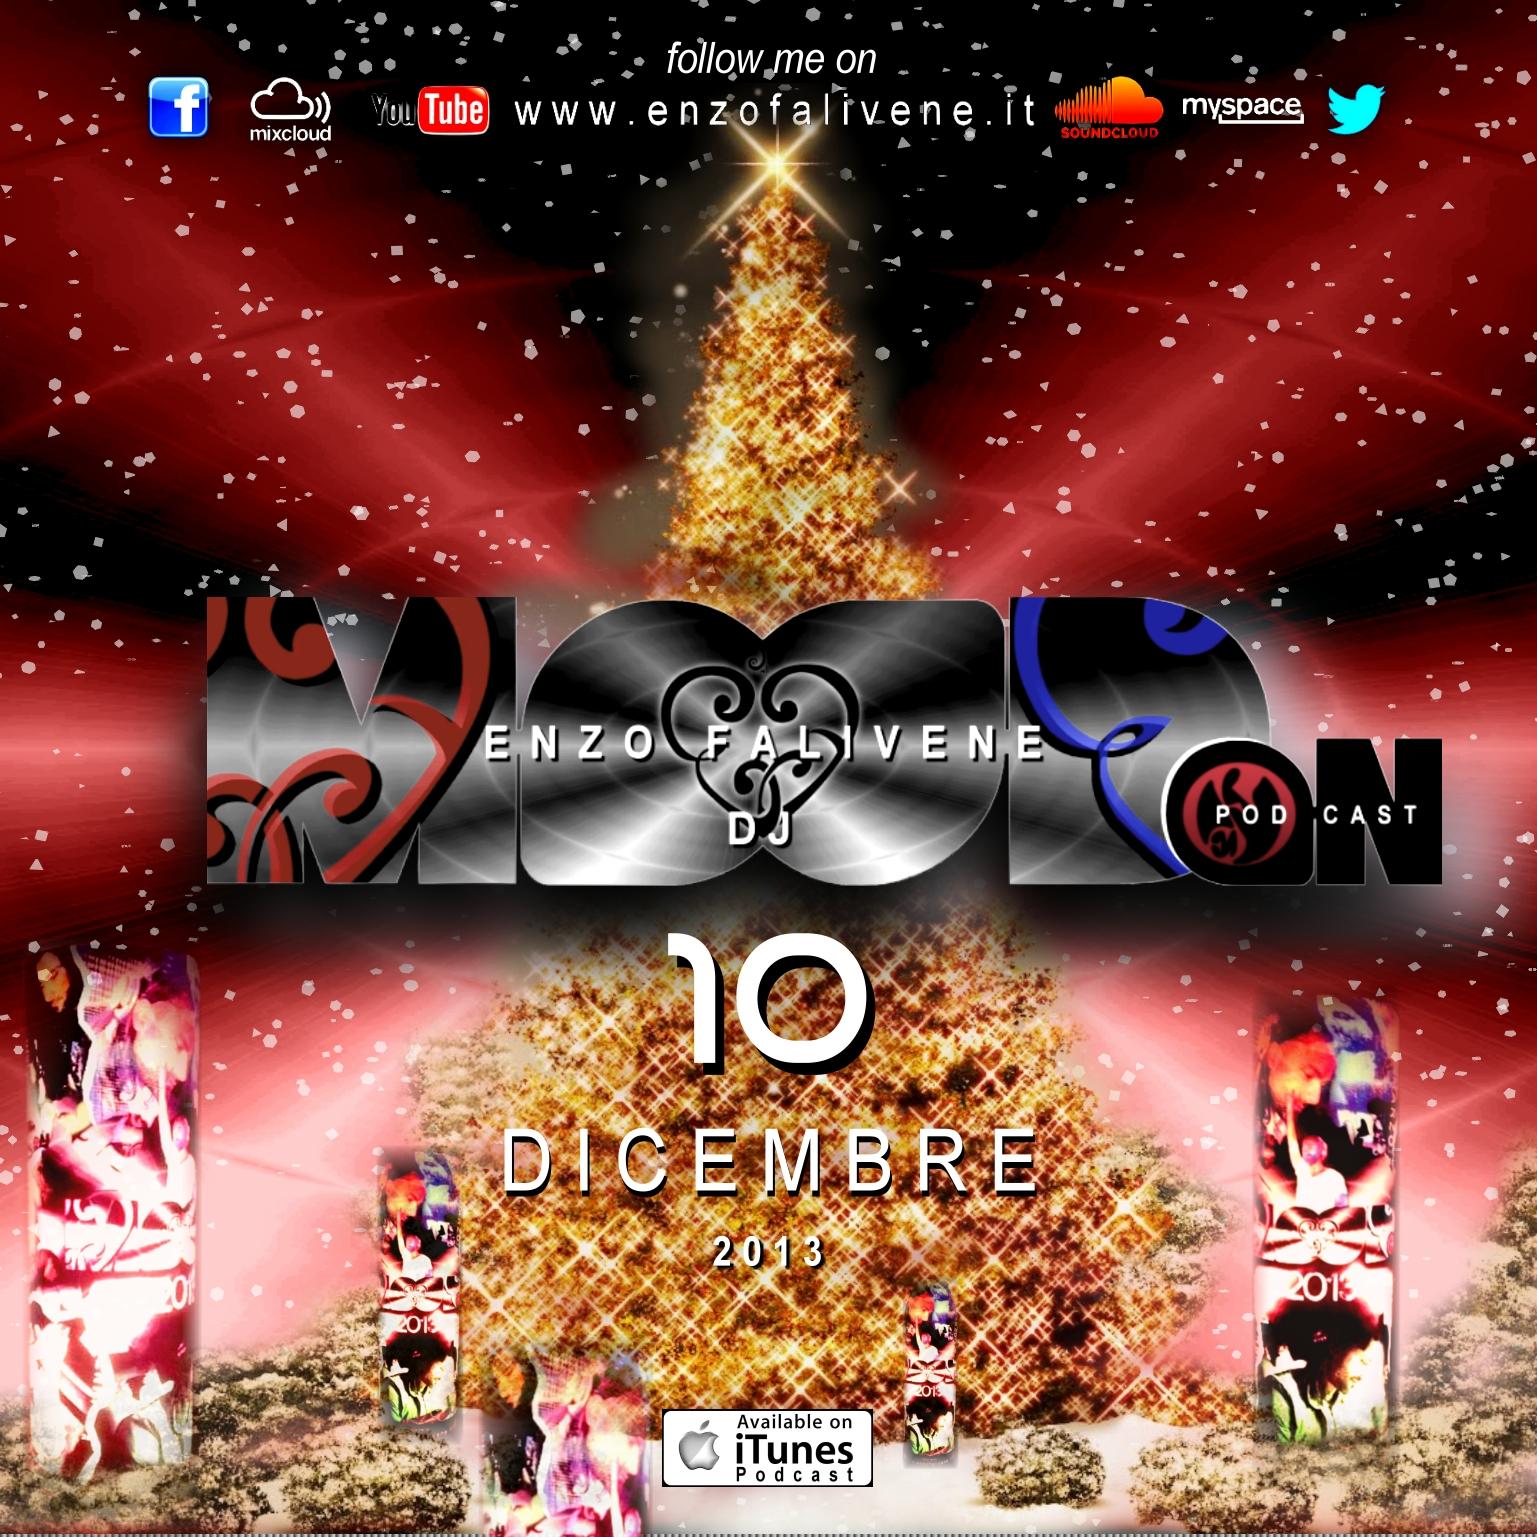 Dj Enzo Falivene - Mood On Dicembre 010 2013